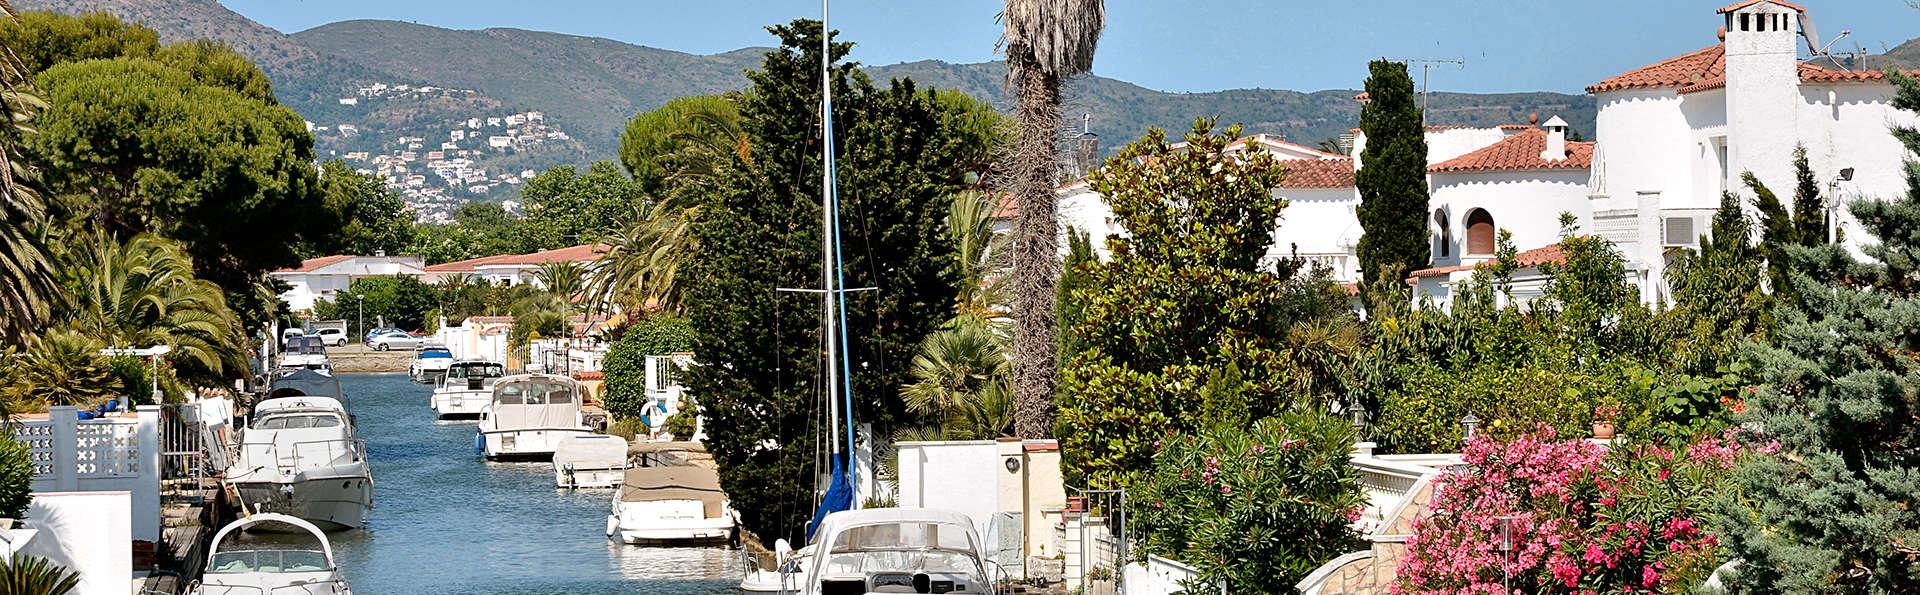 Pierre&Vacances Empuriabrava Marina - EDIT_empuriabrava.jpg